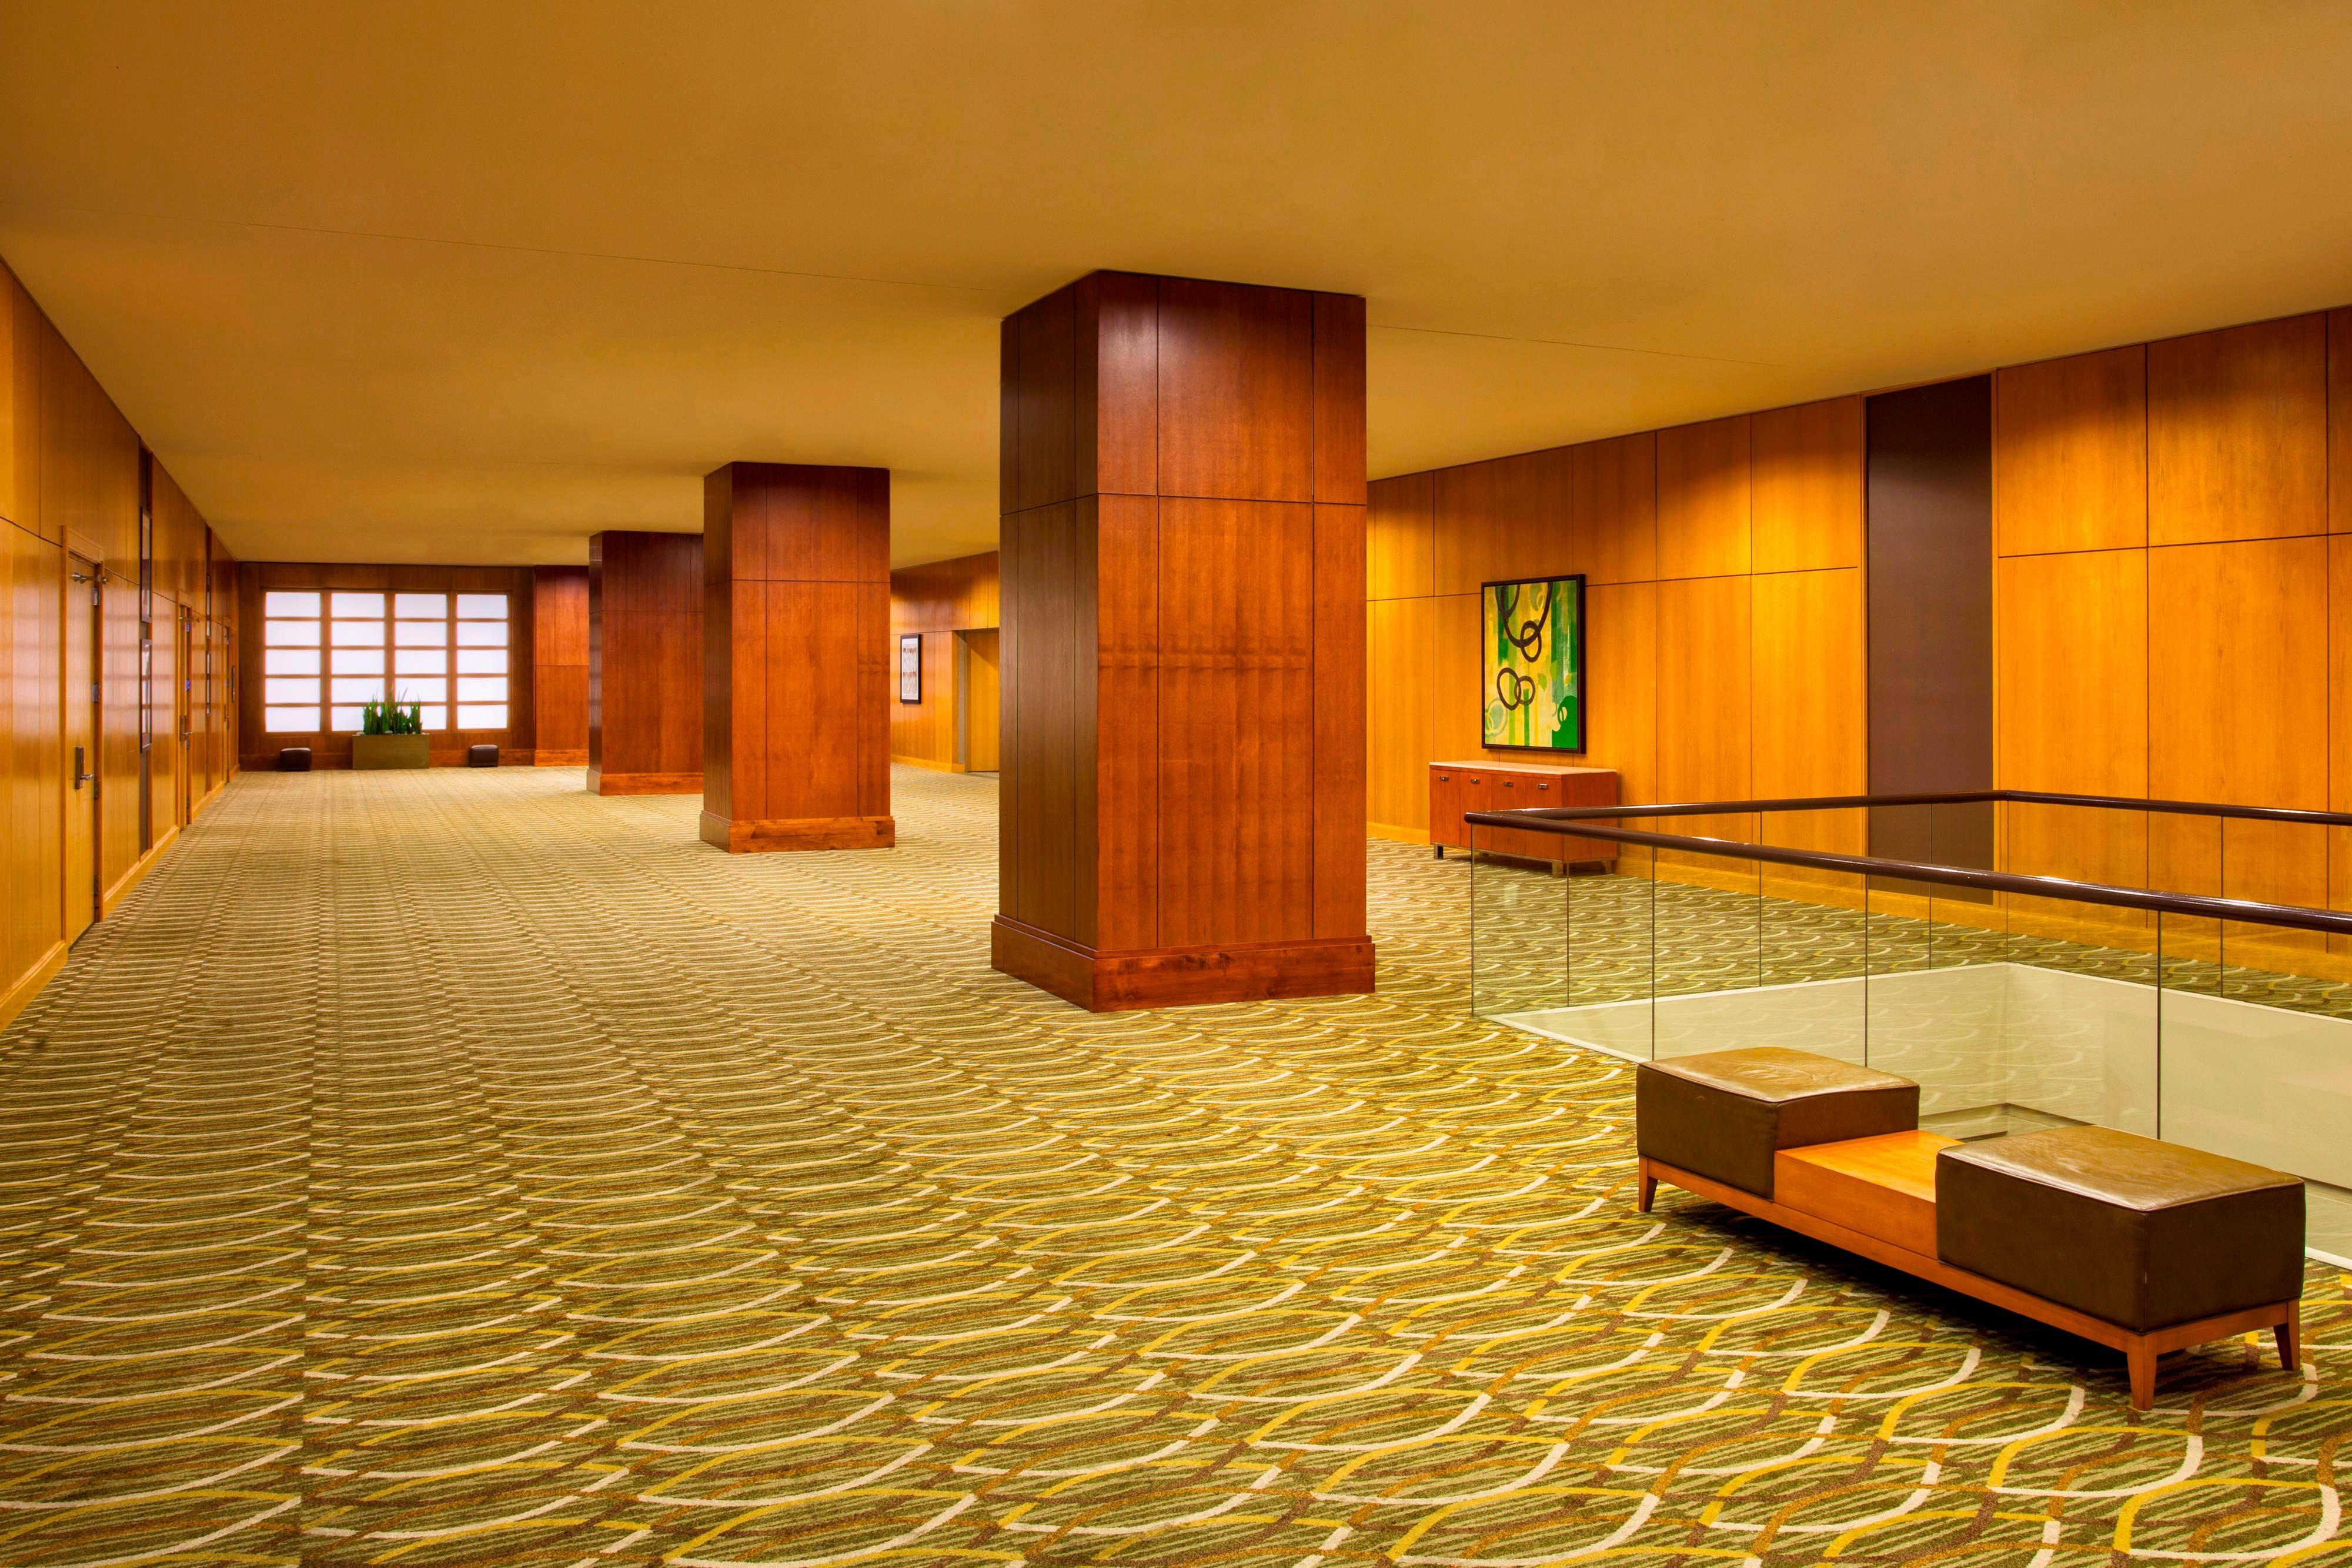 Gibson Foyer